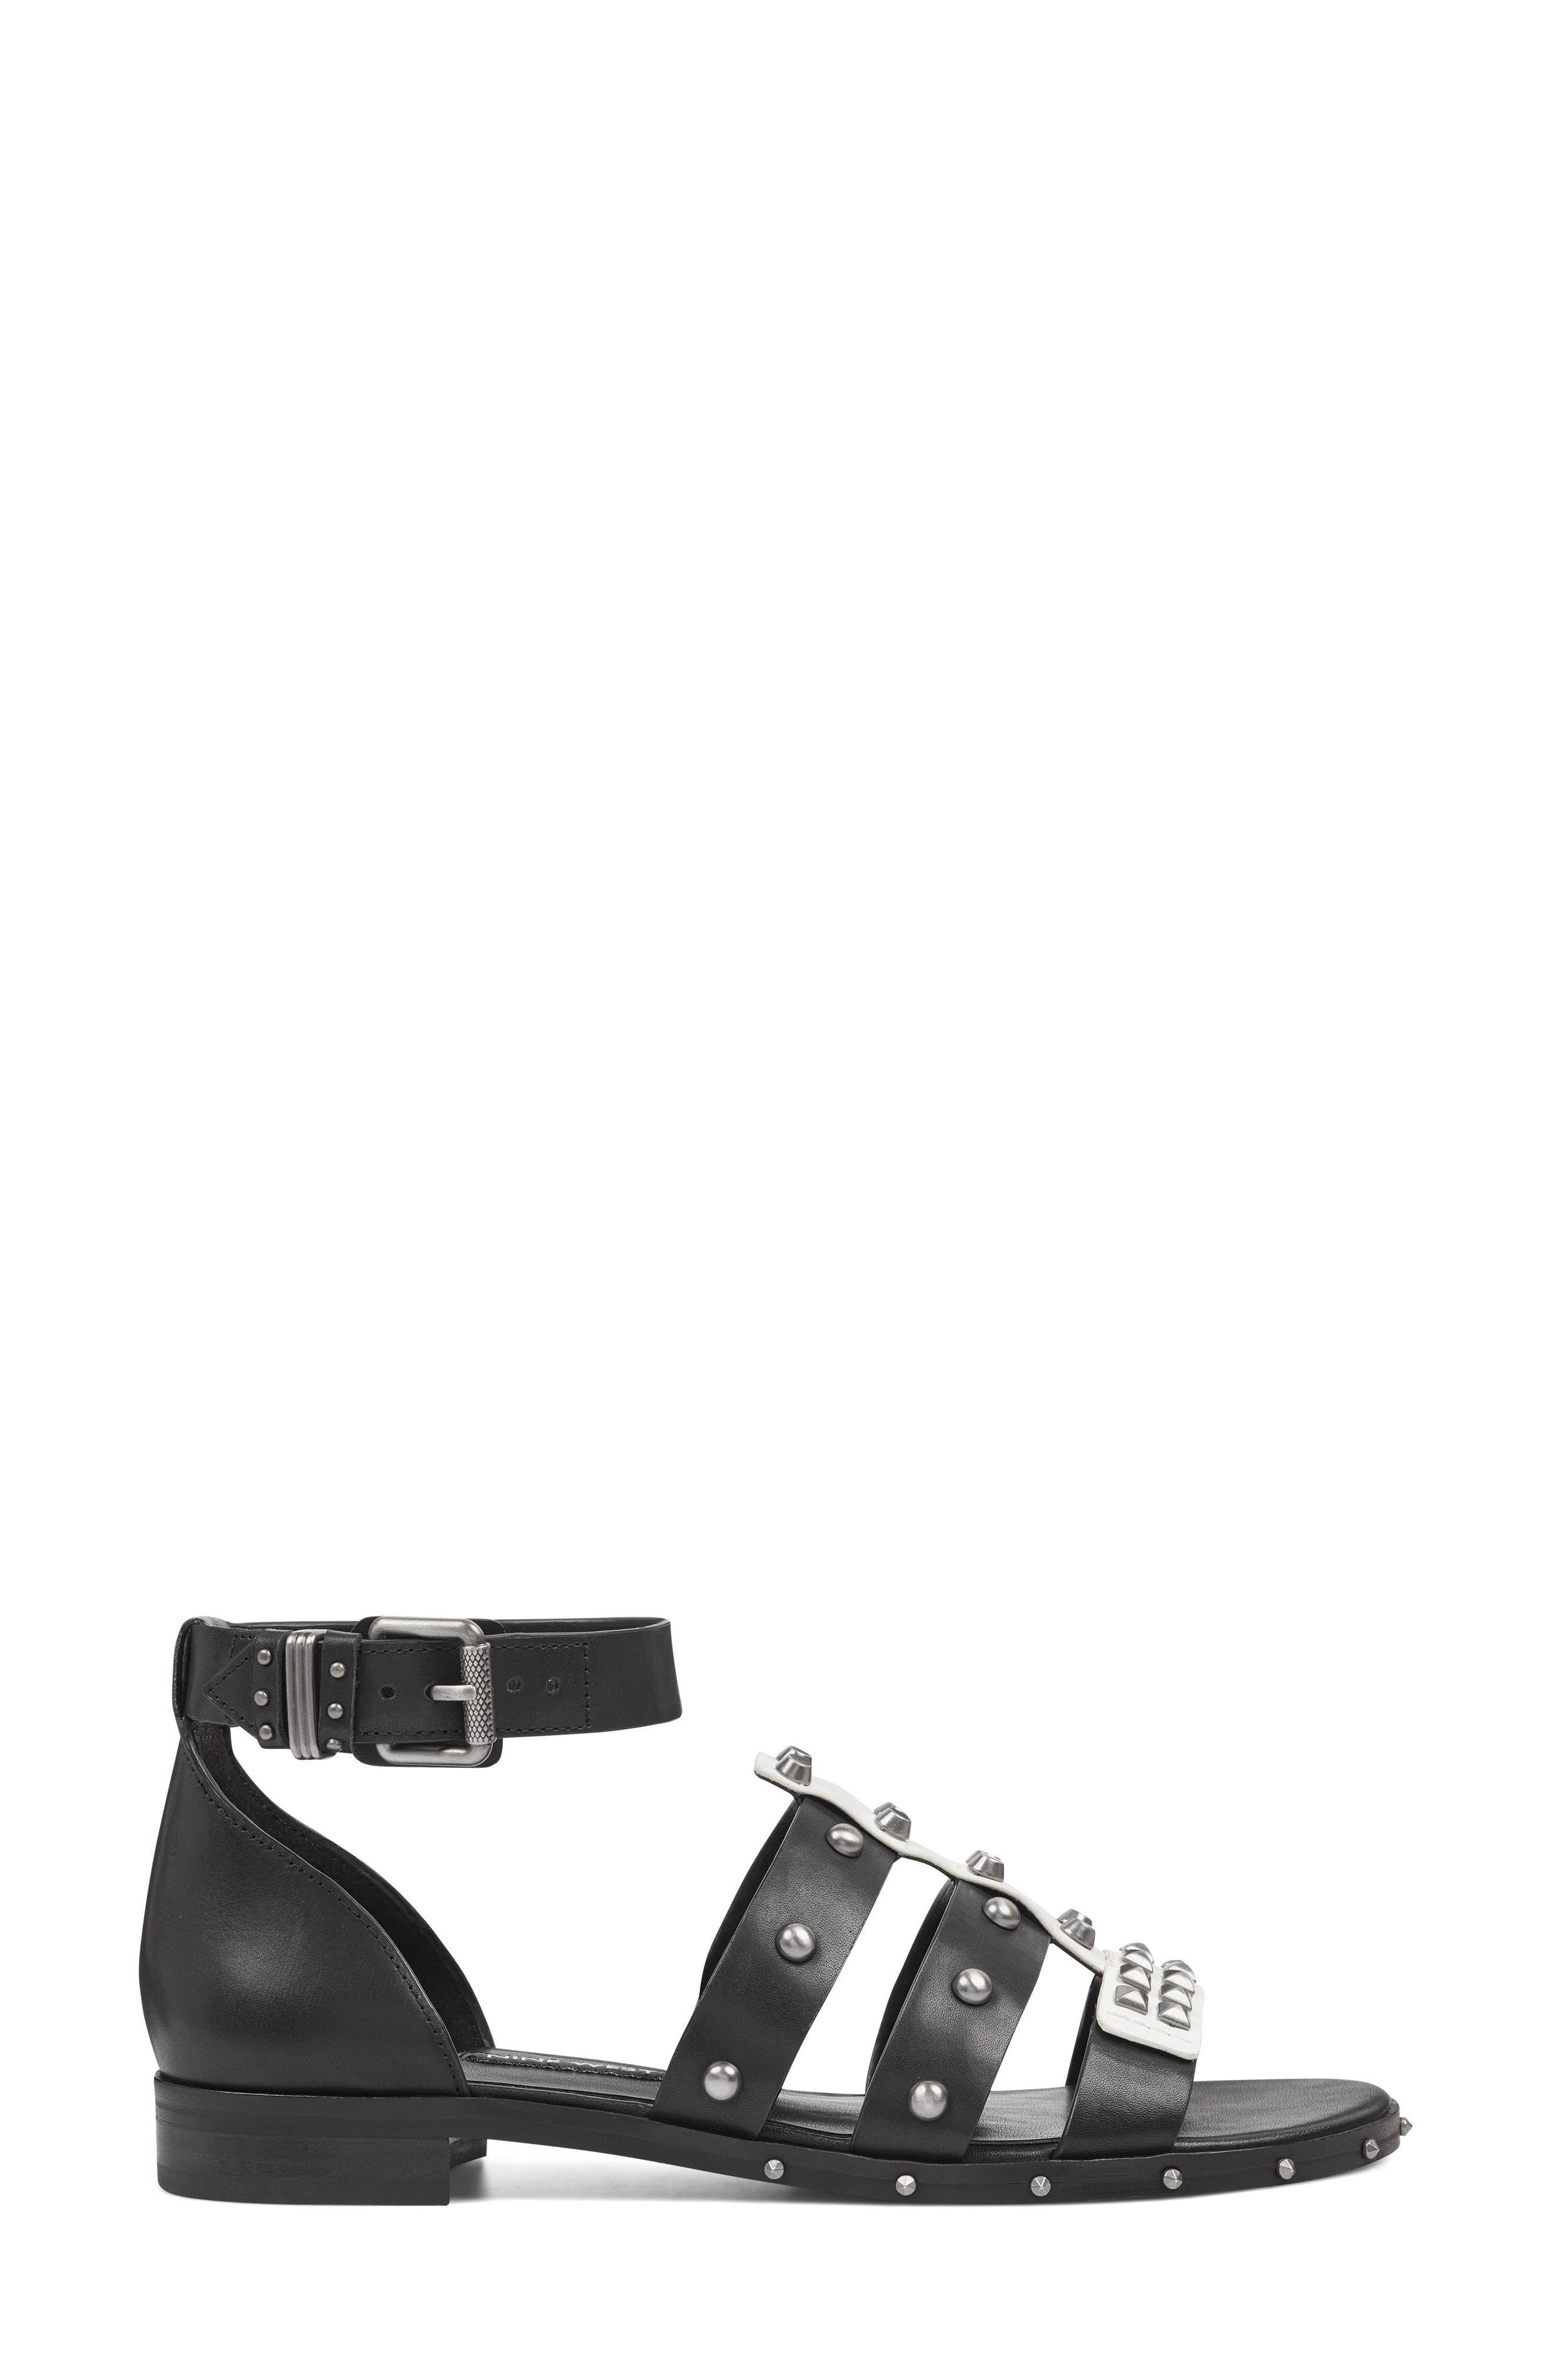 Corisande Sandal,                             Alternate thumbnail 3, color,                             White/ Black Leather